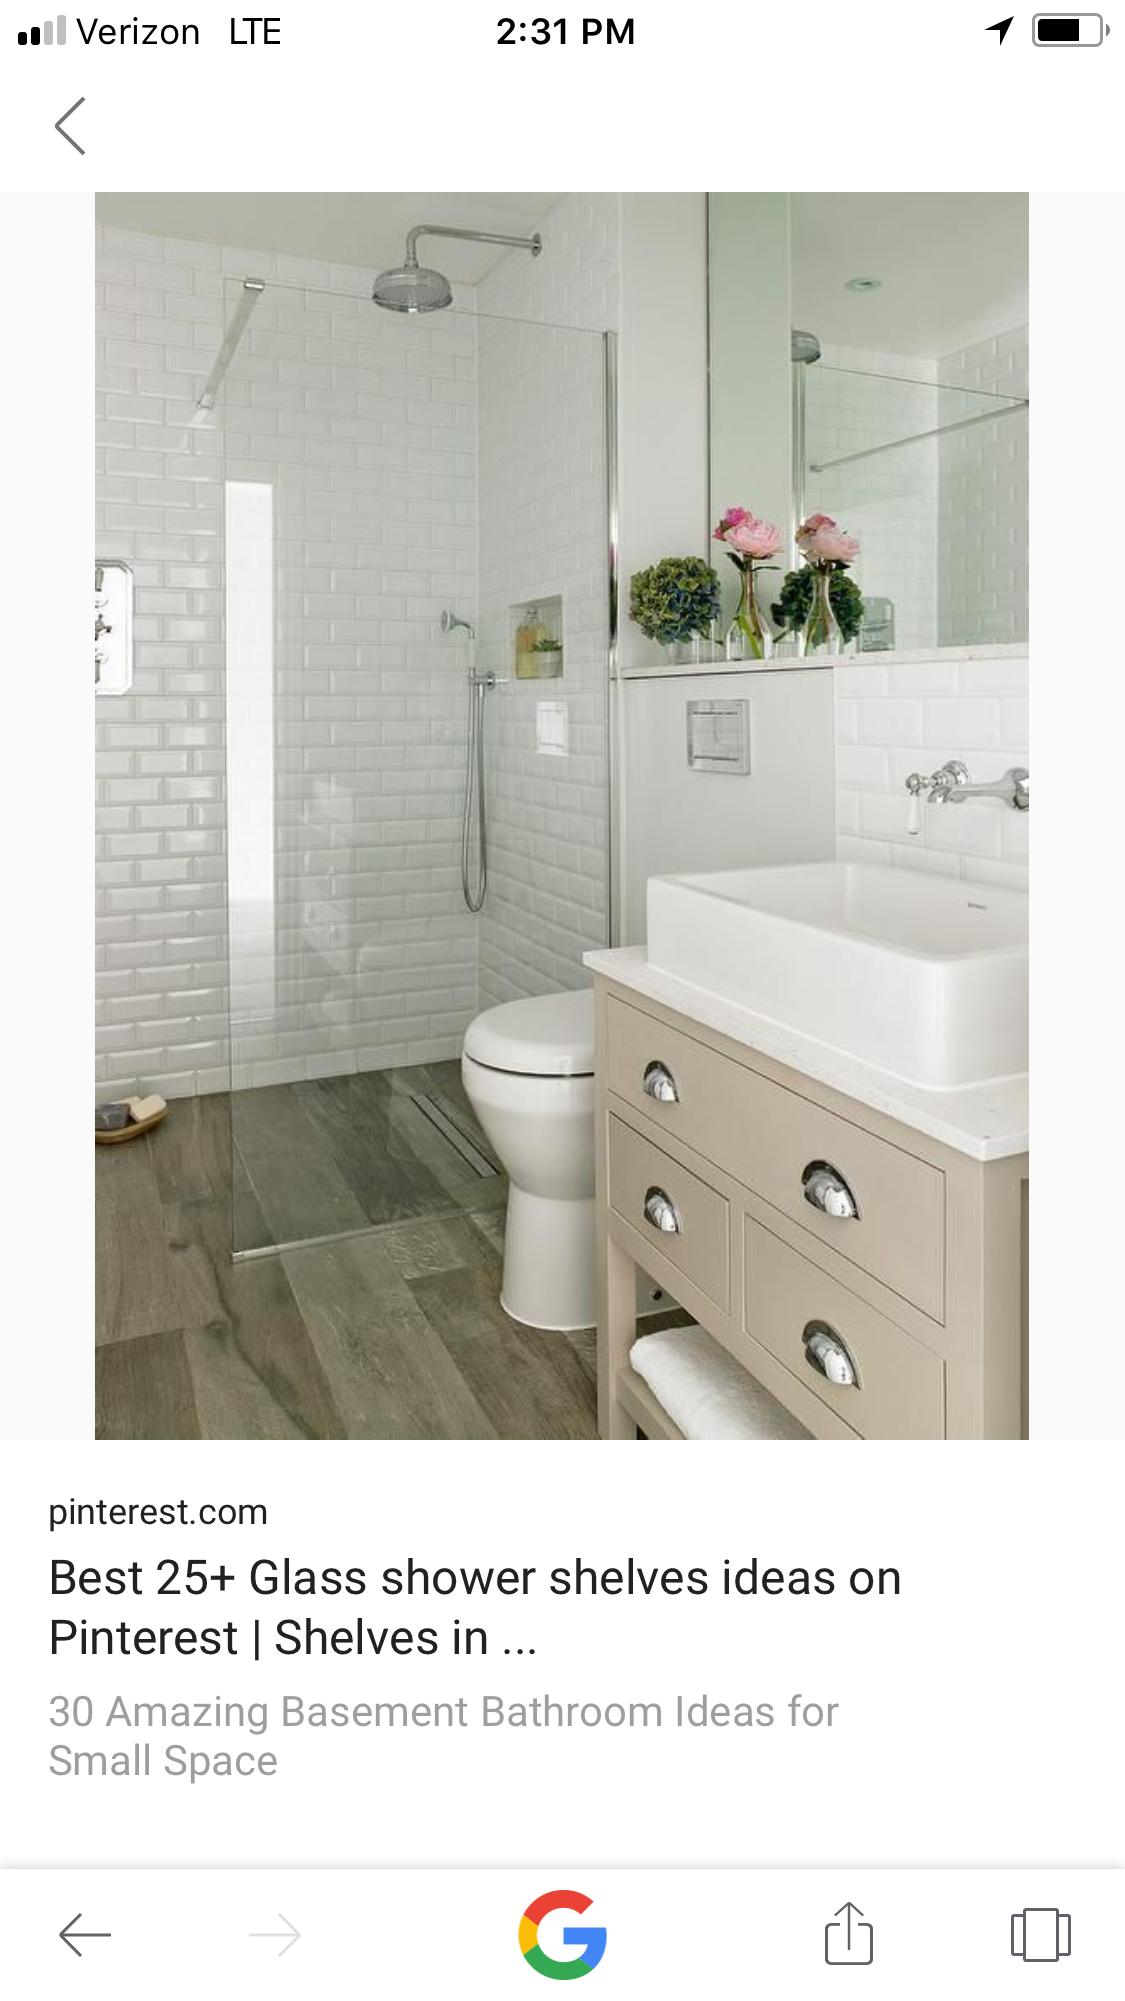 Garden tub decor  Pin by Leighann Parker on Home Favorites  Pinterest  Bathroom